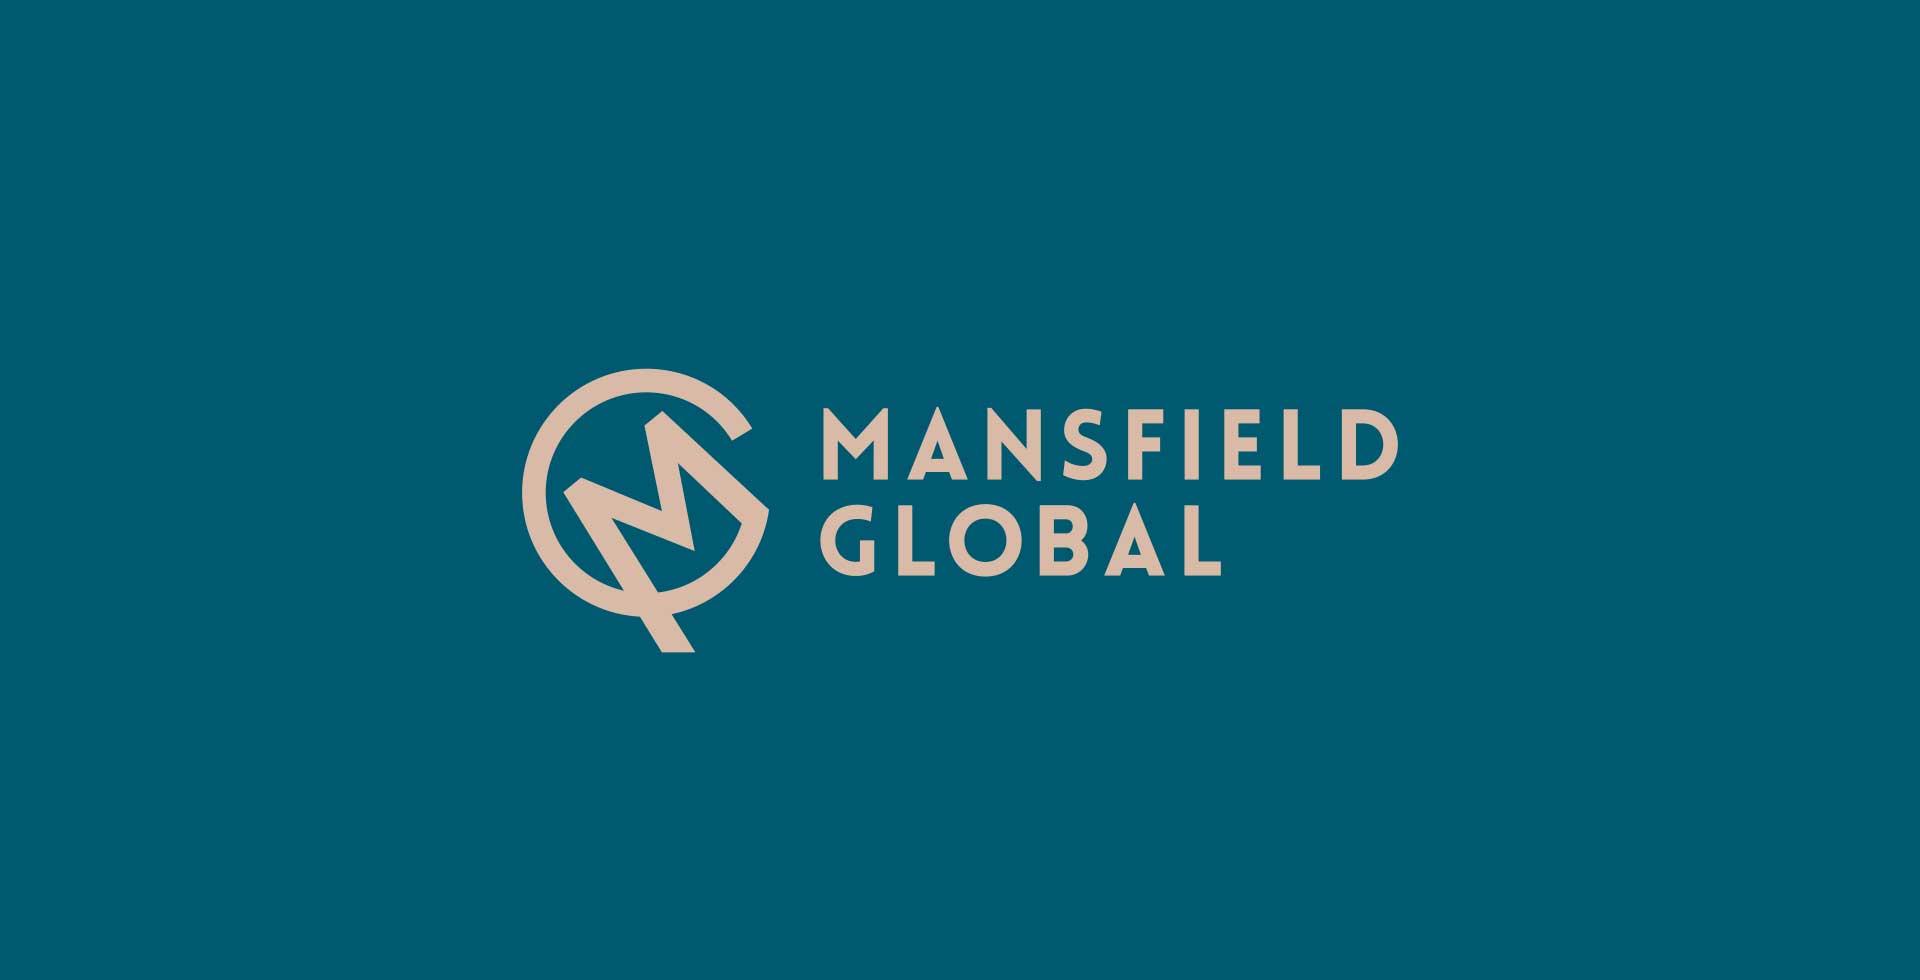 MansfieldGlobal_01